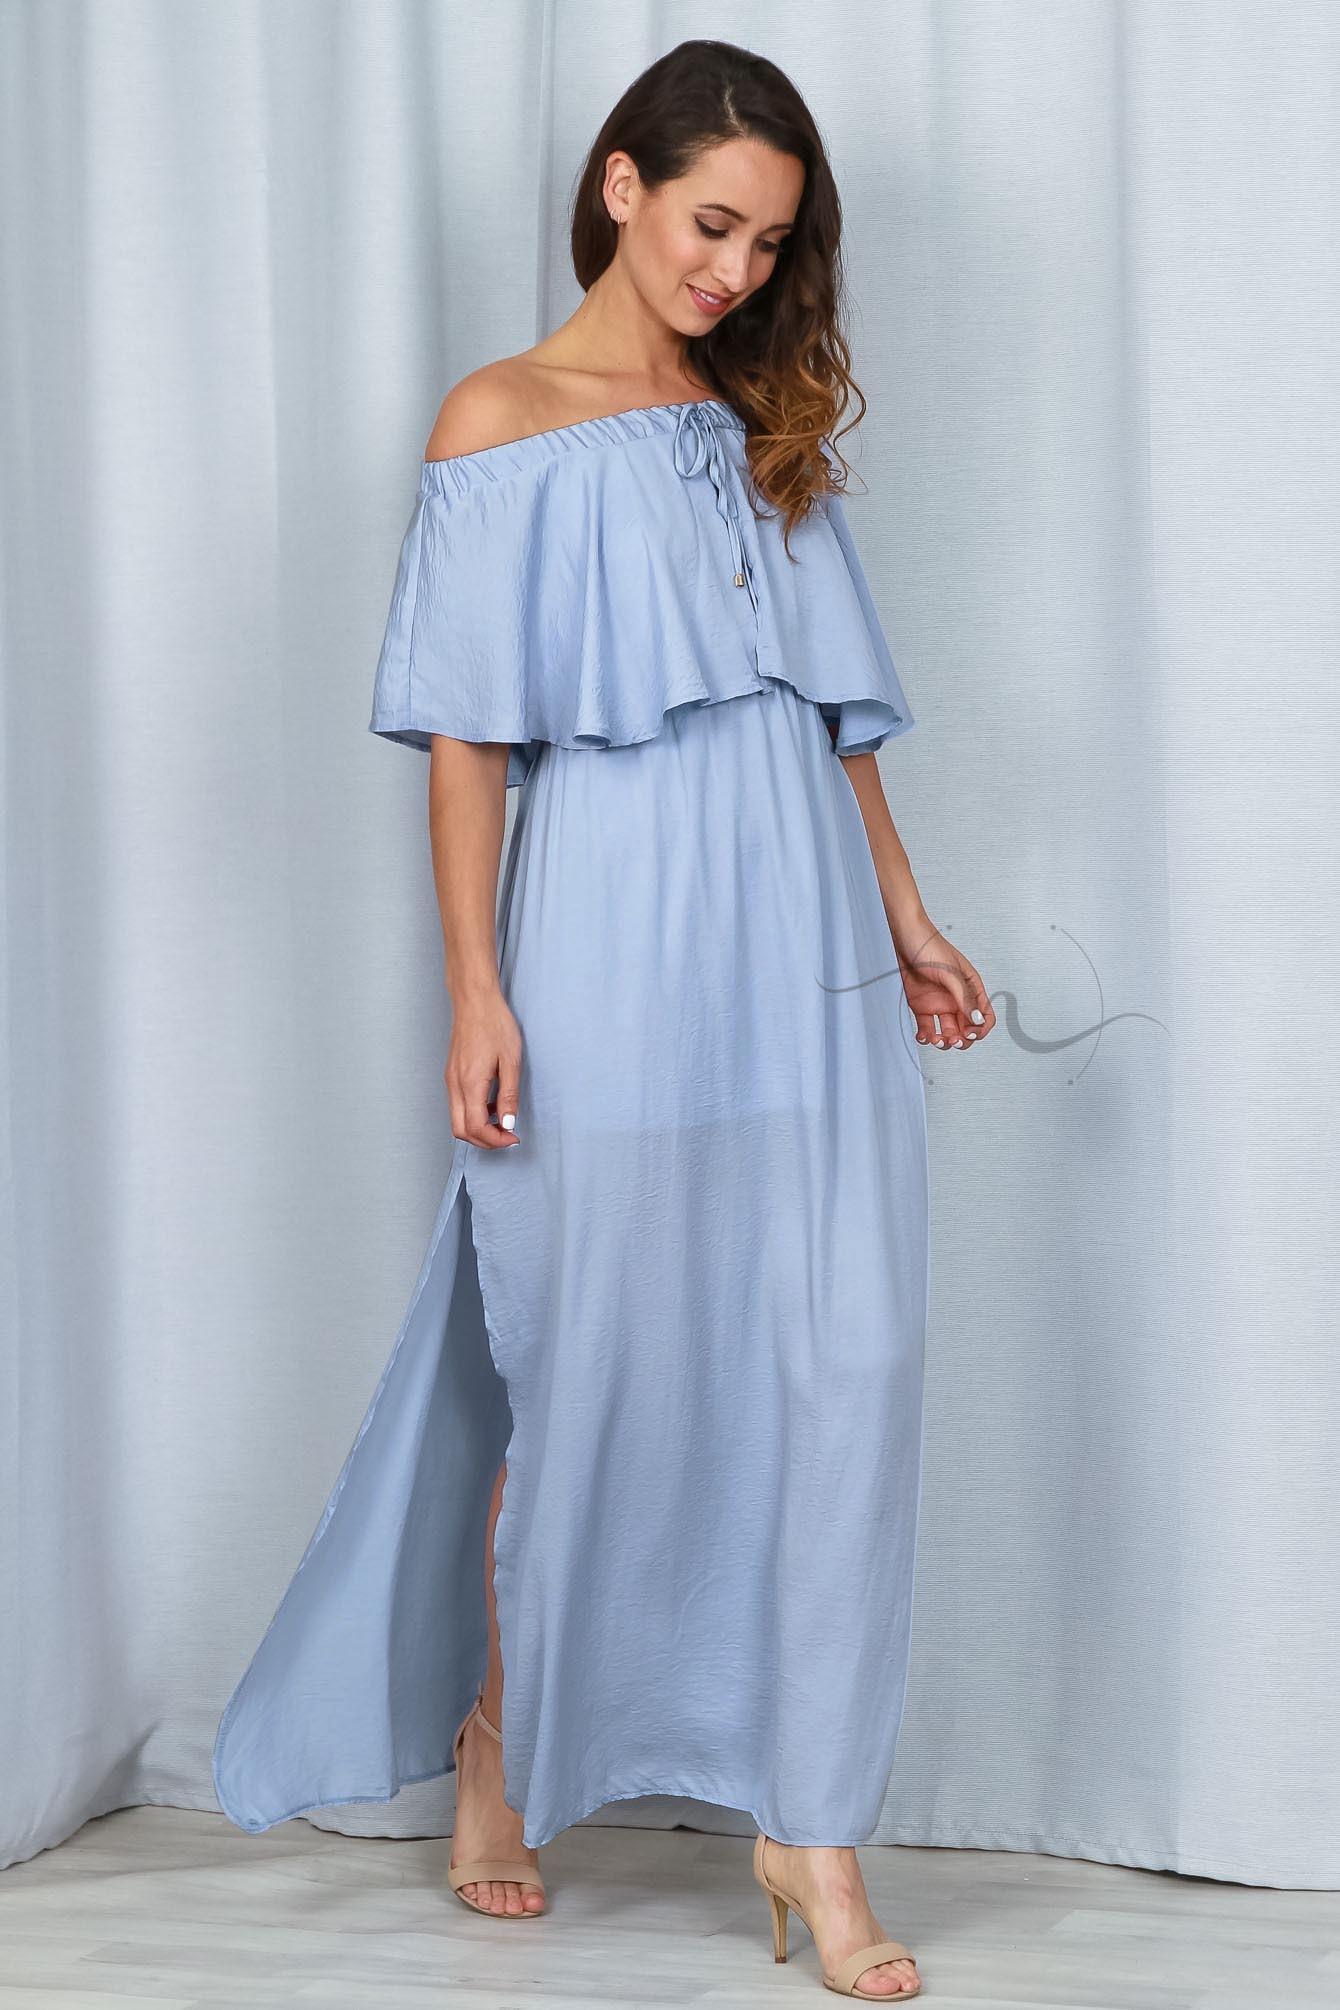 94170f830013 Τα Καλύτερα Maxi Φορέματα για όλους τους τύπους σώματος - Eli.gr